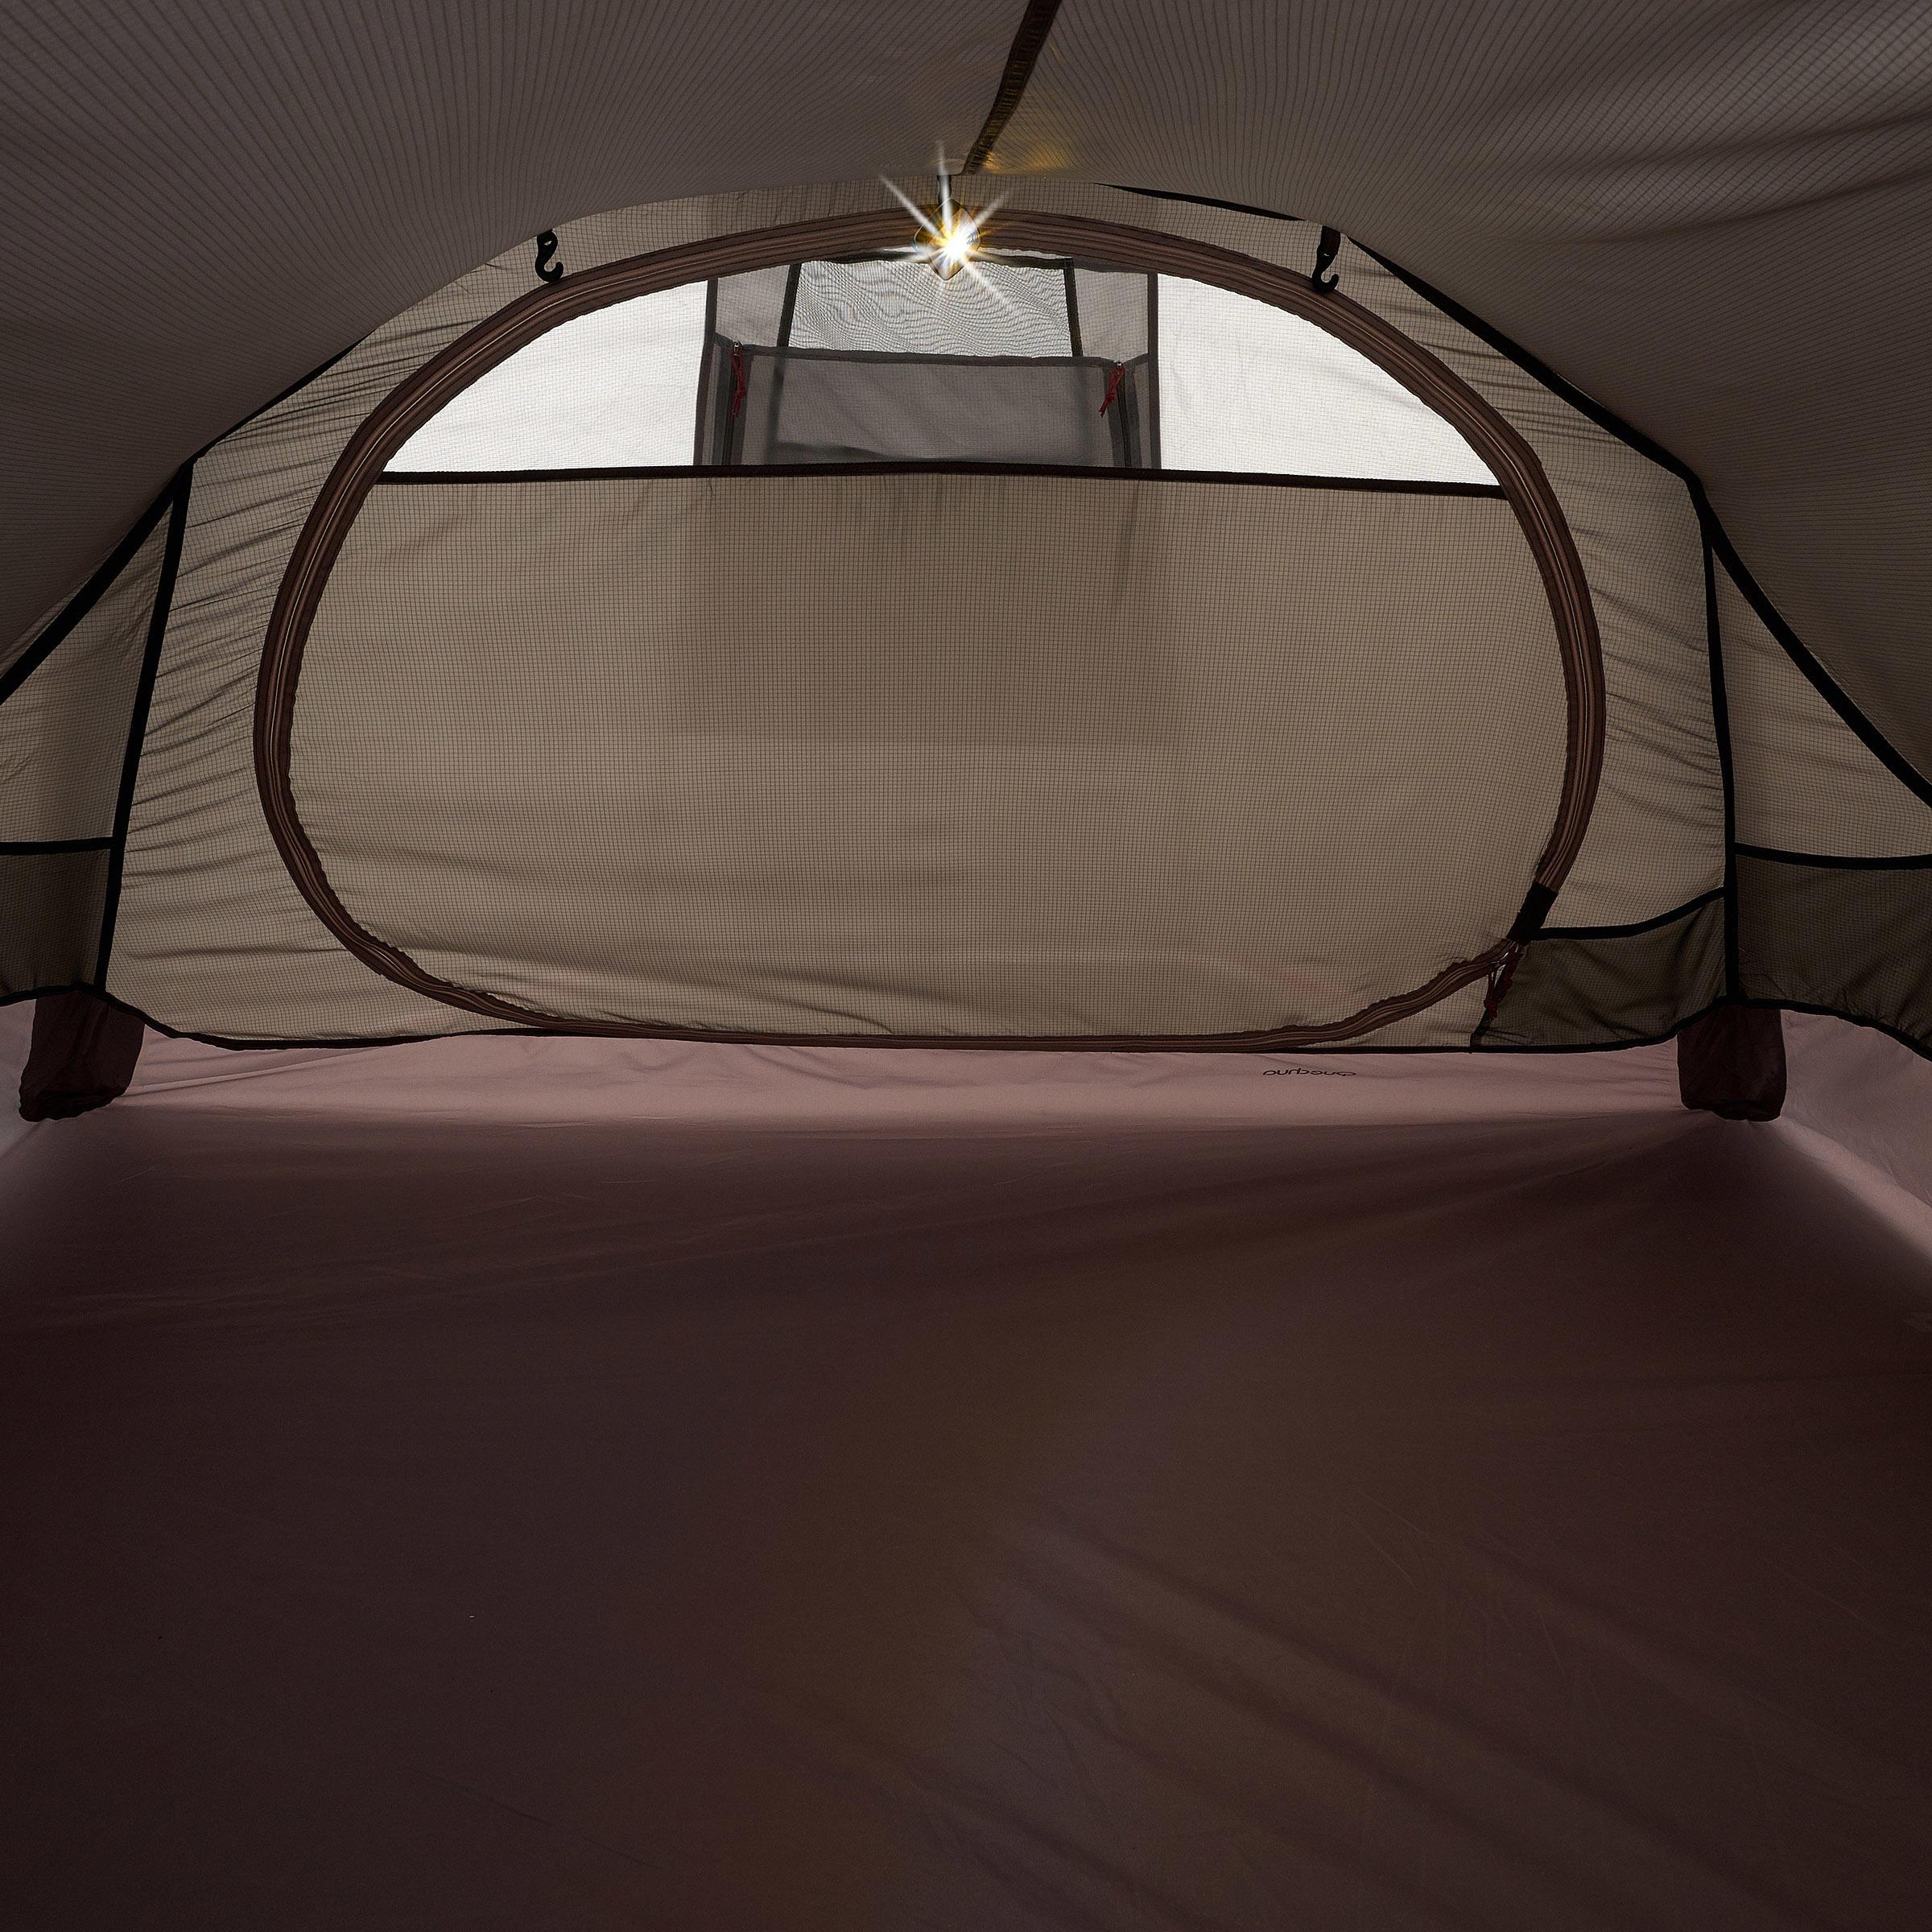 Tente de trek Quickhiker Ultralight 3 personnes gris clair